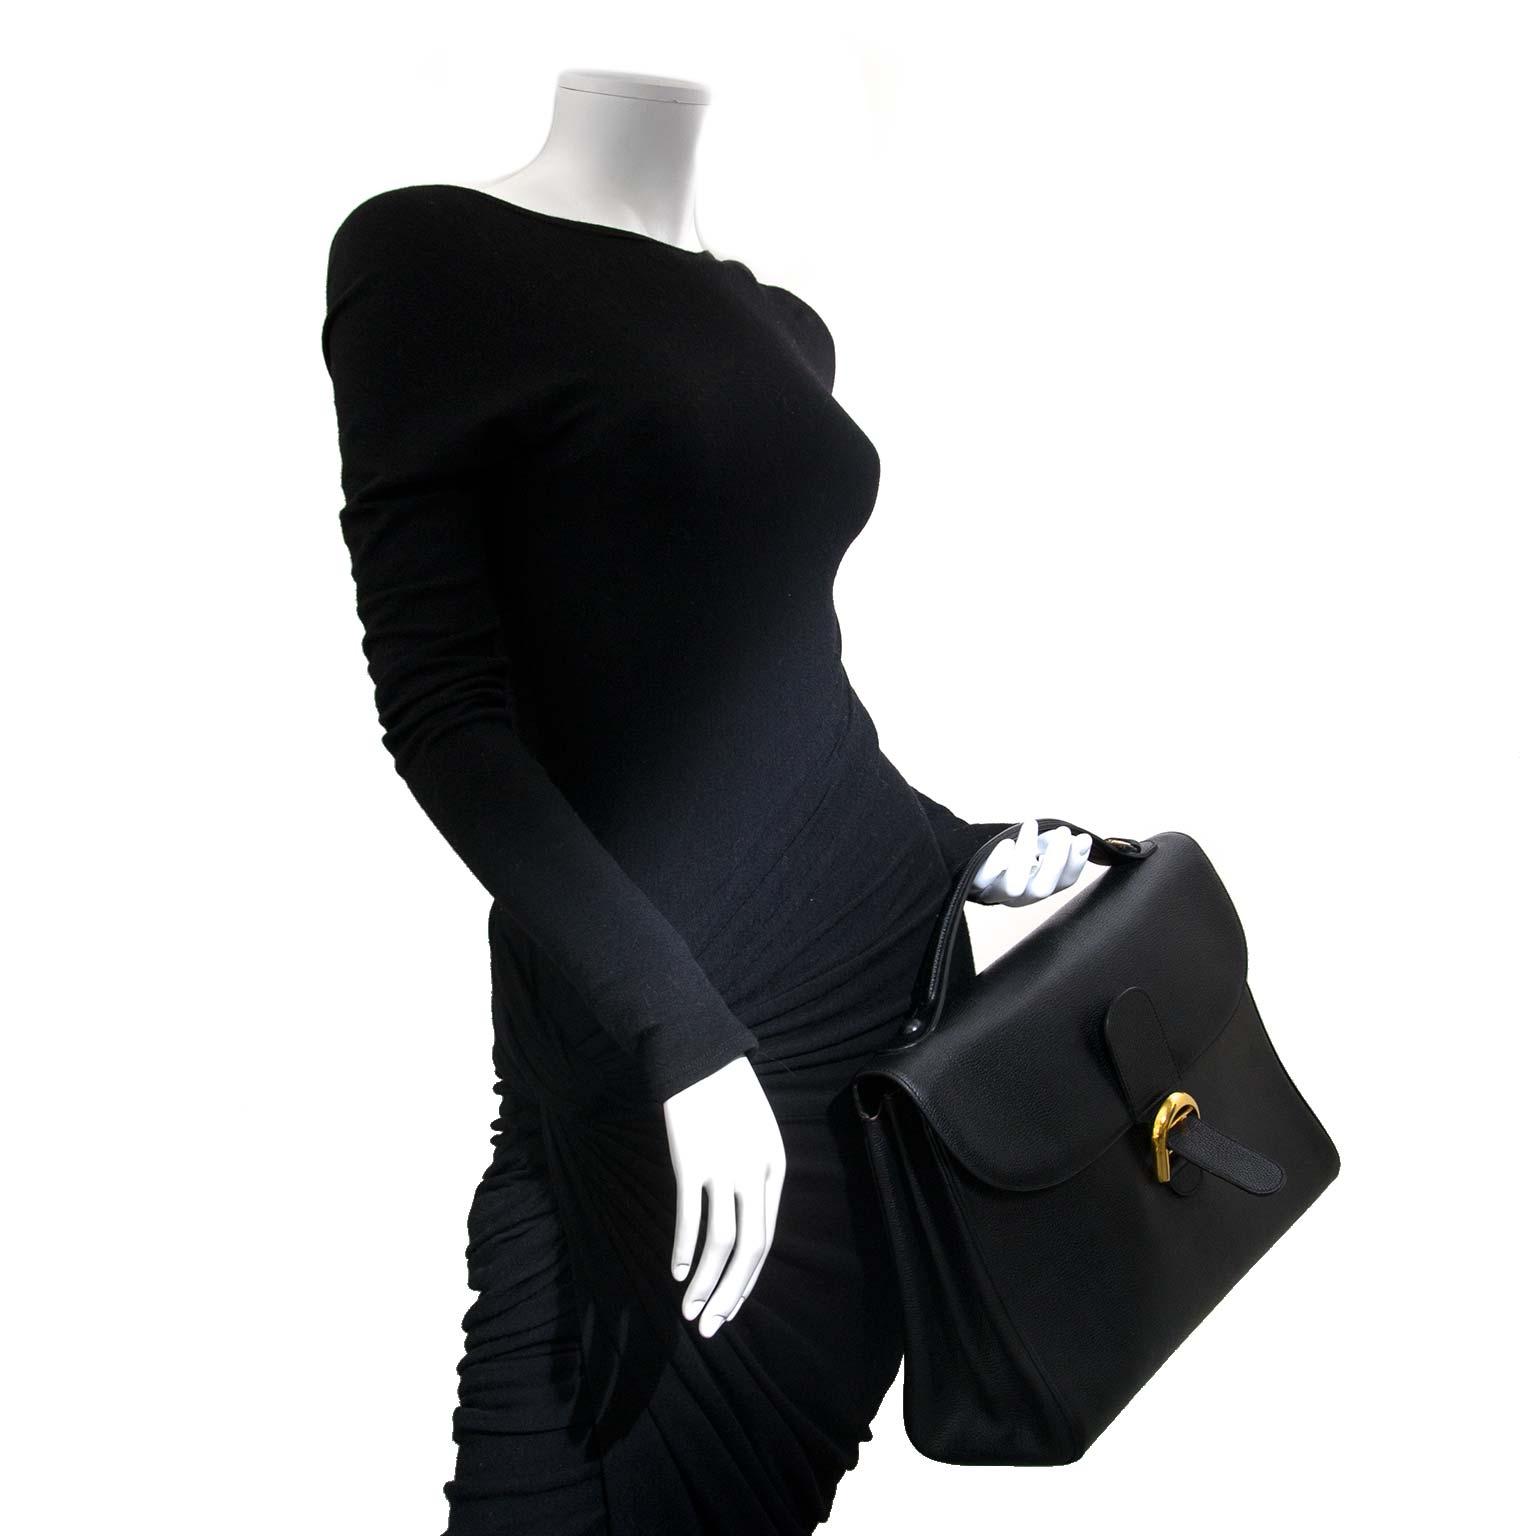 6e74252d2f66 ... delvaux black brillant briefcase now for sale at labellov vintage  fashion webshop belgium